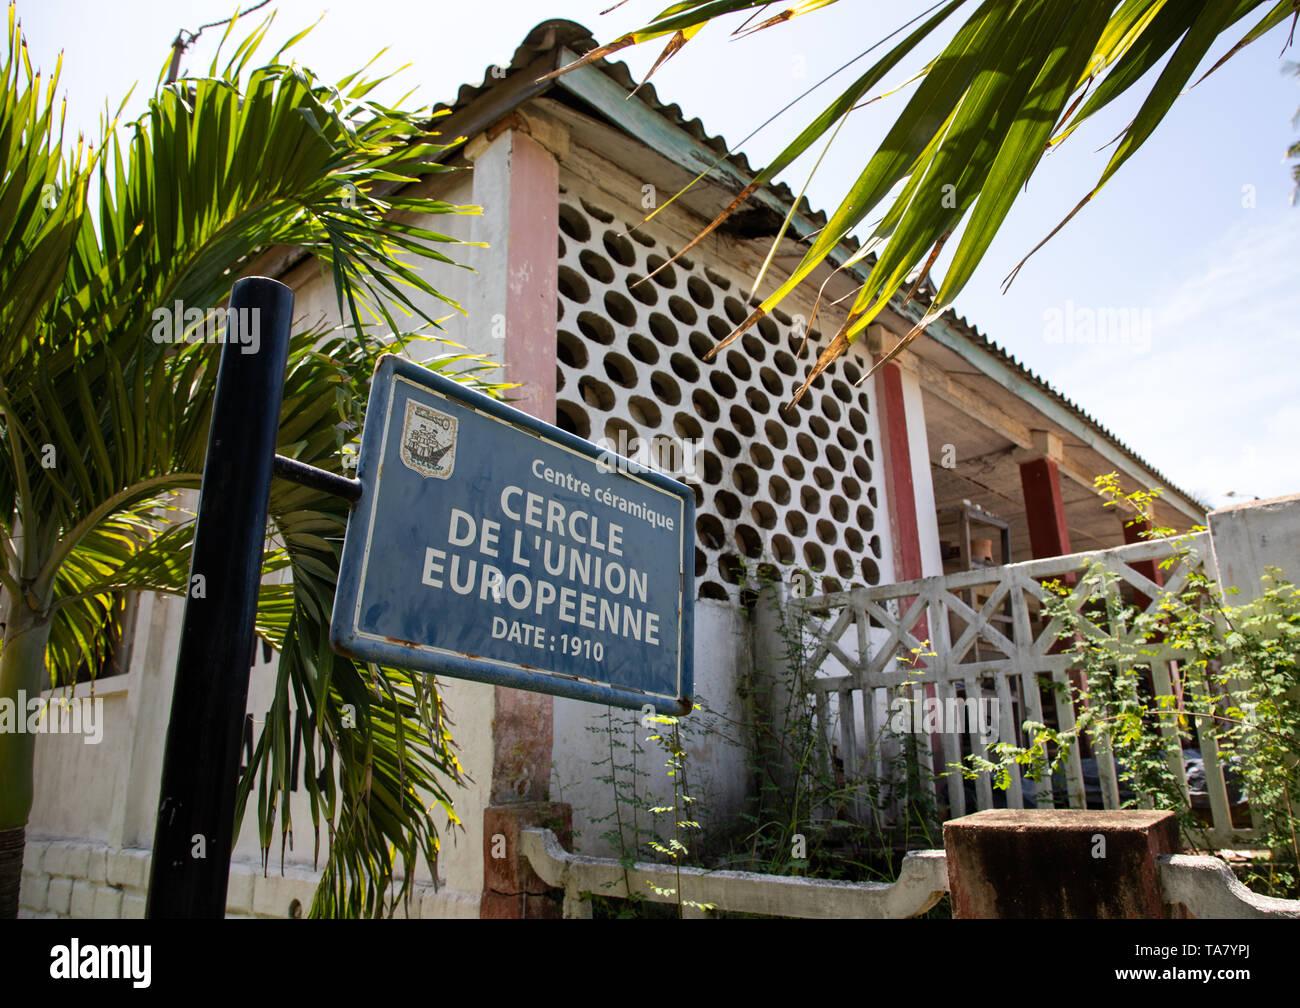 Centre céramique formerly cercle de l'union européenne, Sud-Comoé, Grand-Bassam, Ivory Coast - Stock Image